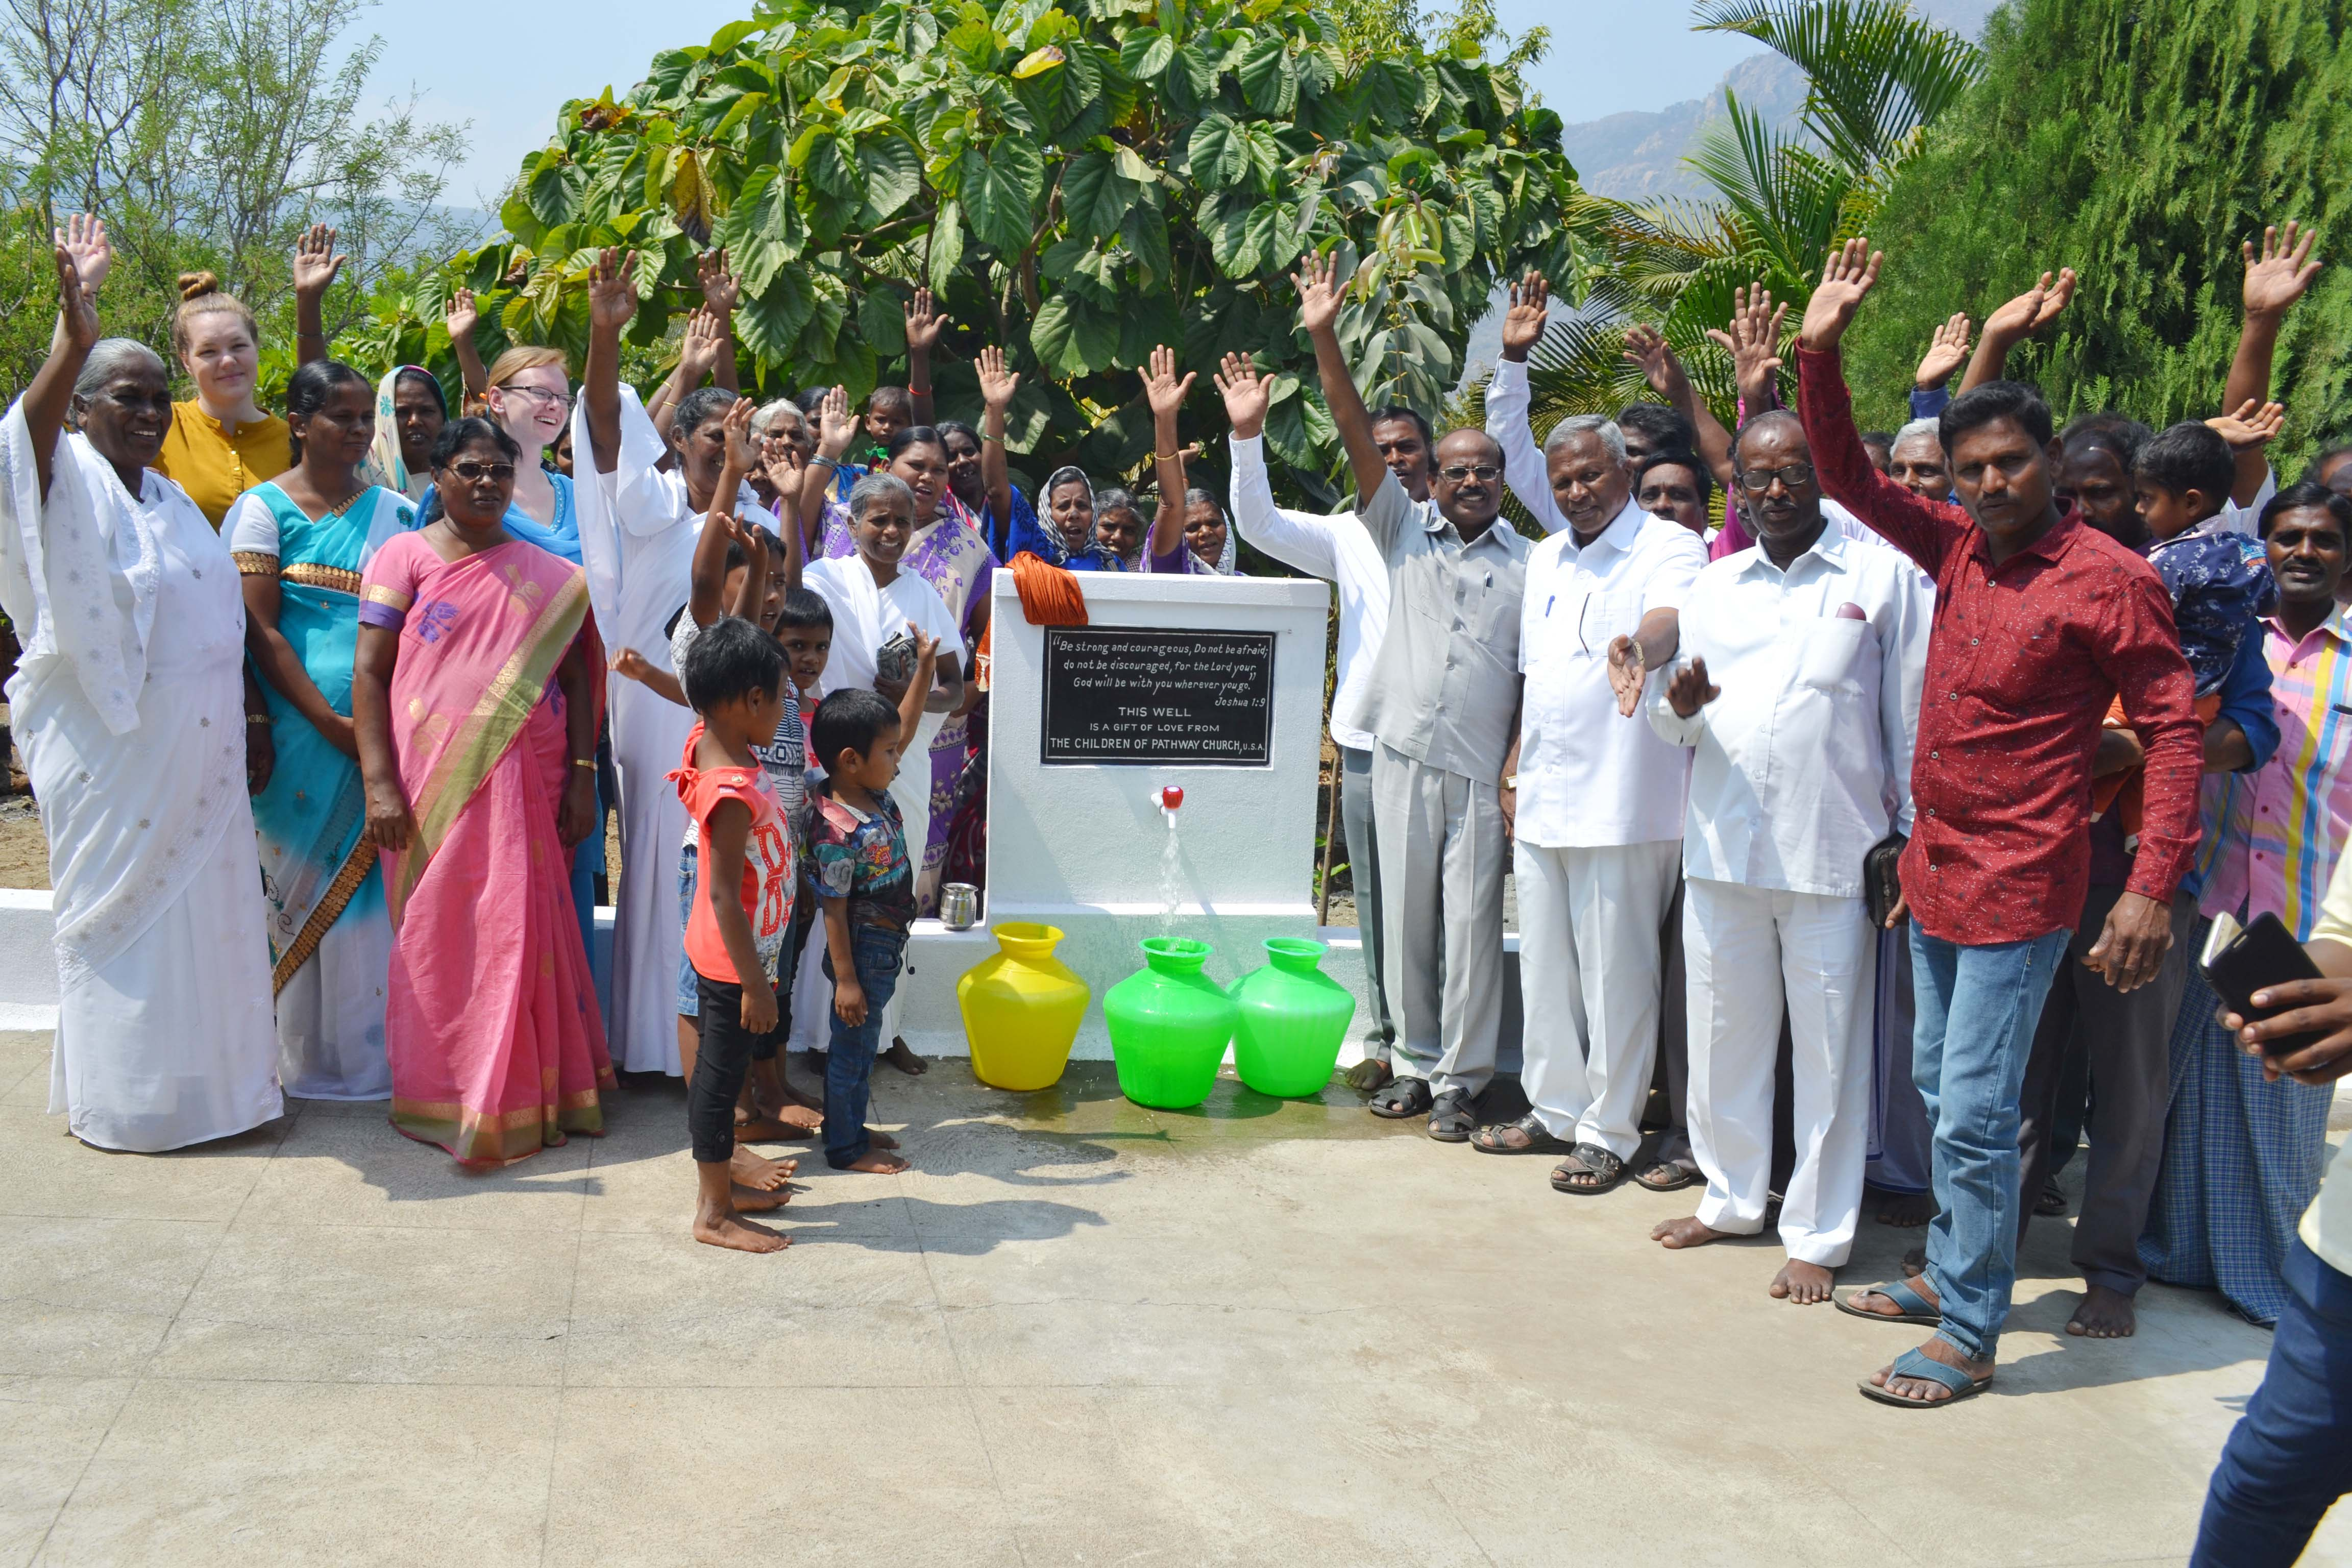 Tiruppathur_Water Well Dedication_Feb. 2019 (16)